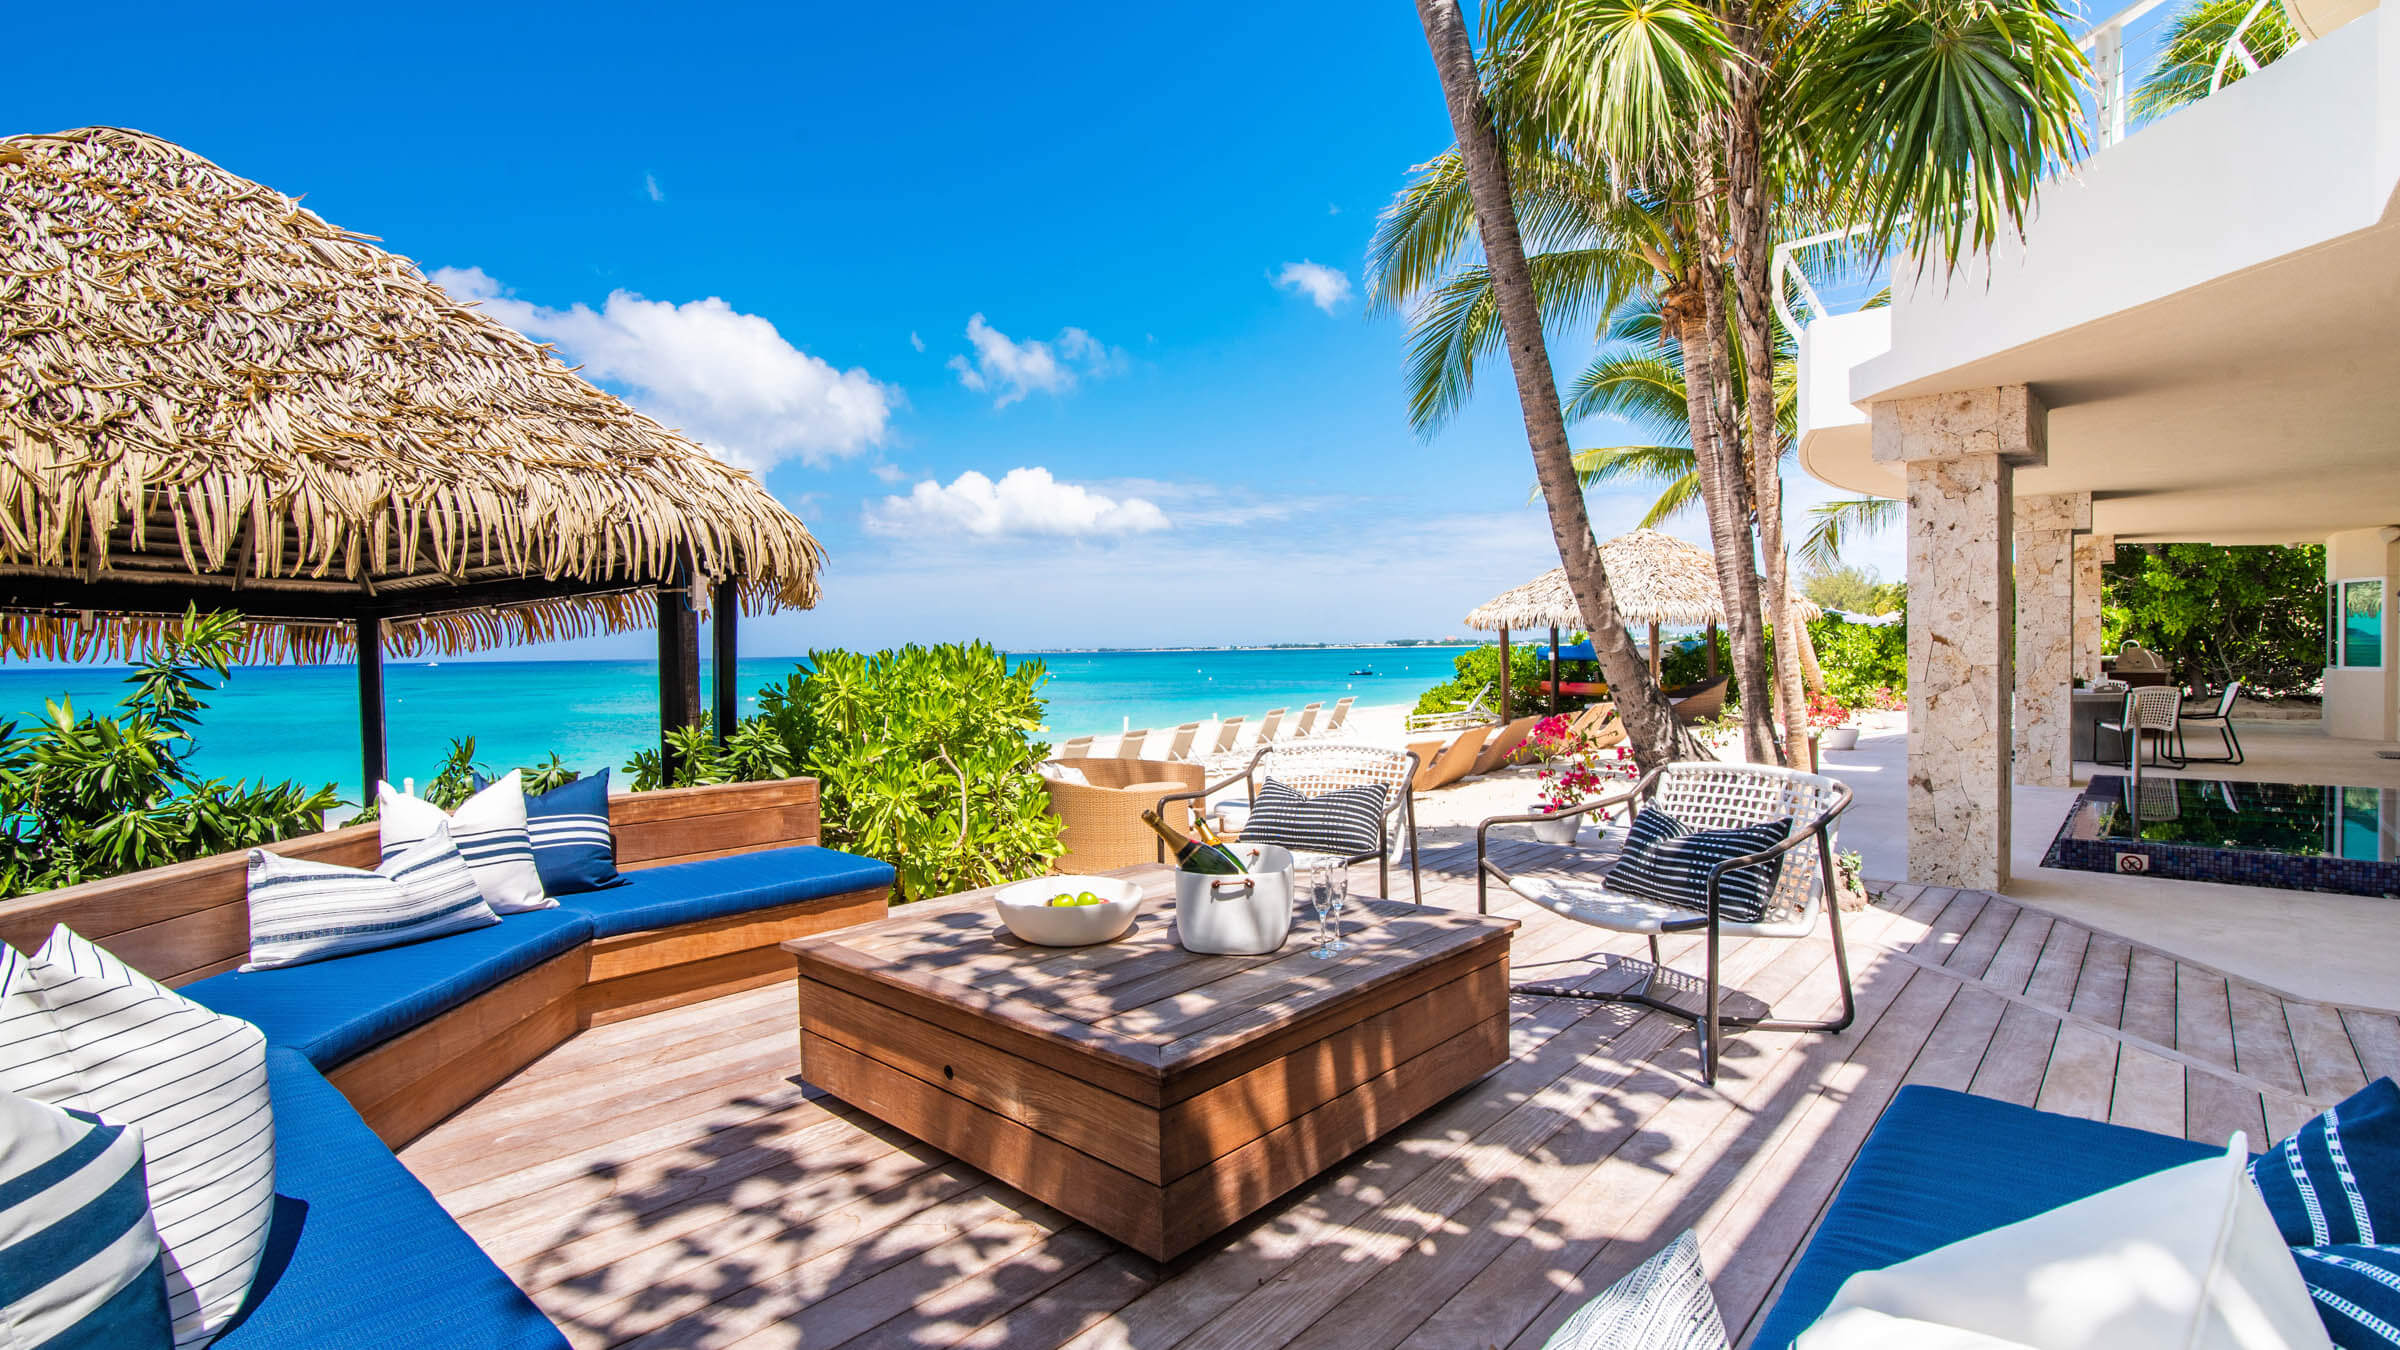 Seascape-Villa-Beach-Villa-Cayman-Islands-Grand-Cayman-Paradise-Beachfront-Deck-Outdoor-Lounge-Chairs-and-Seating-Area-Ocean-View.jpg